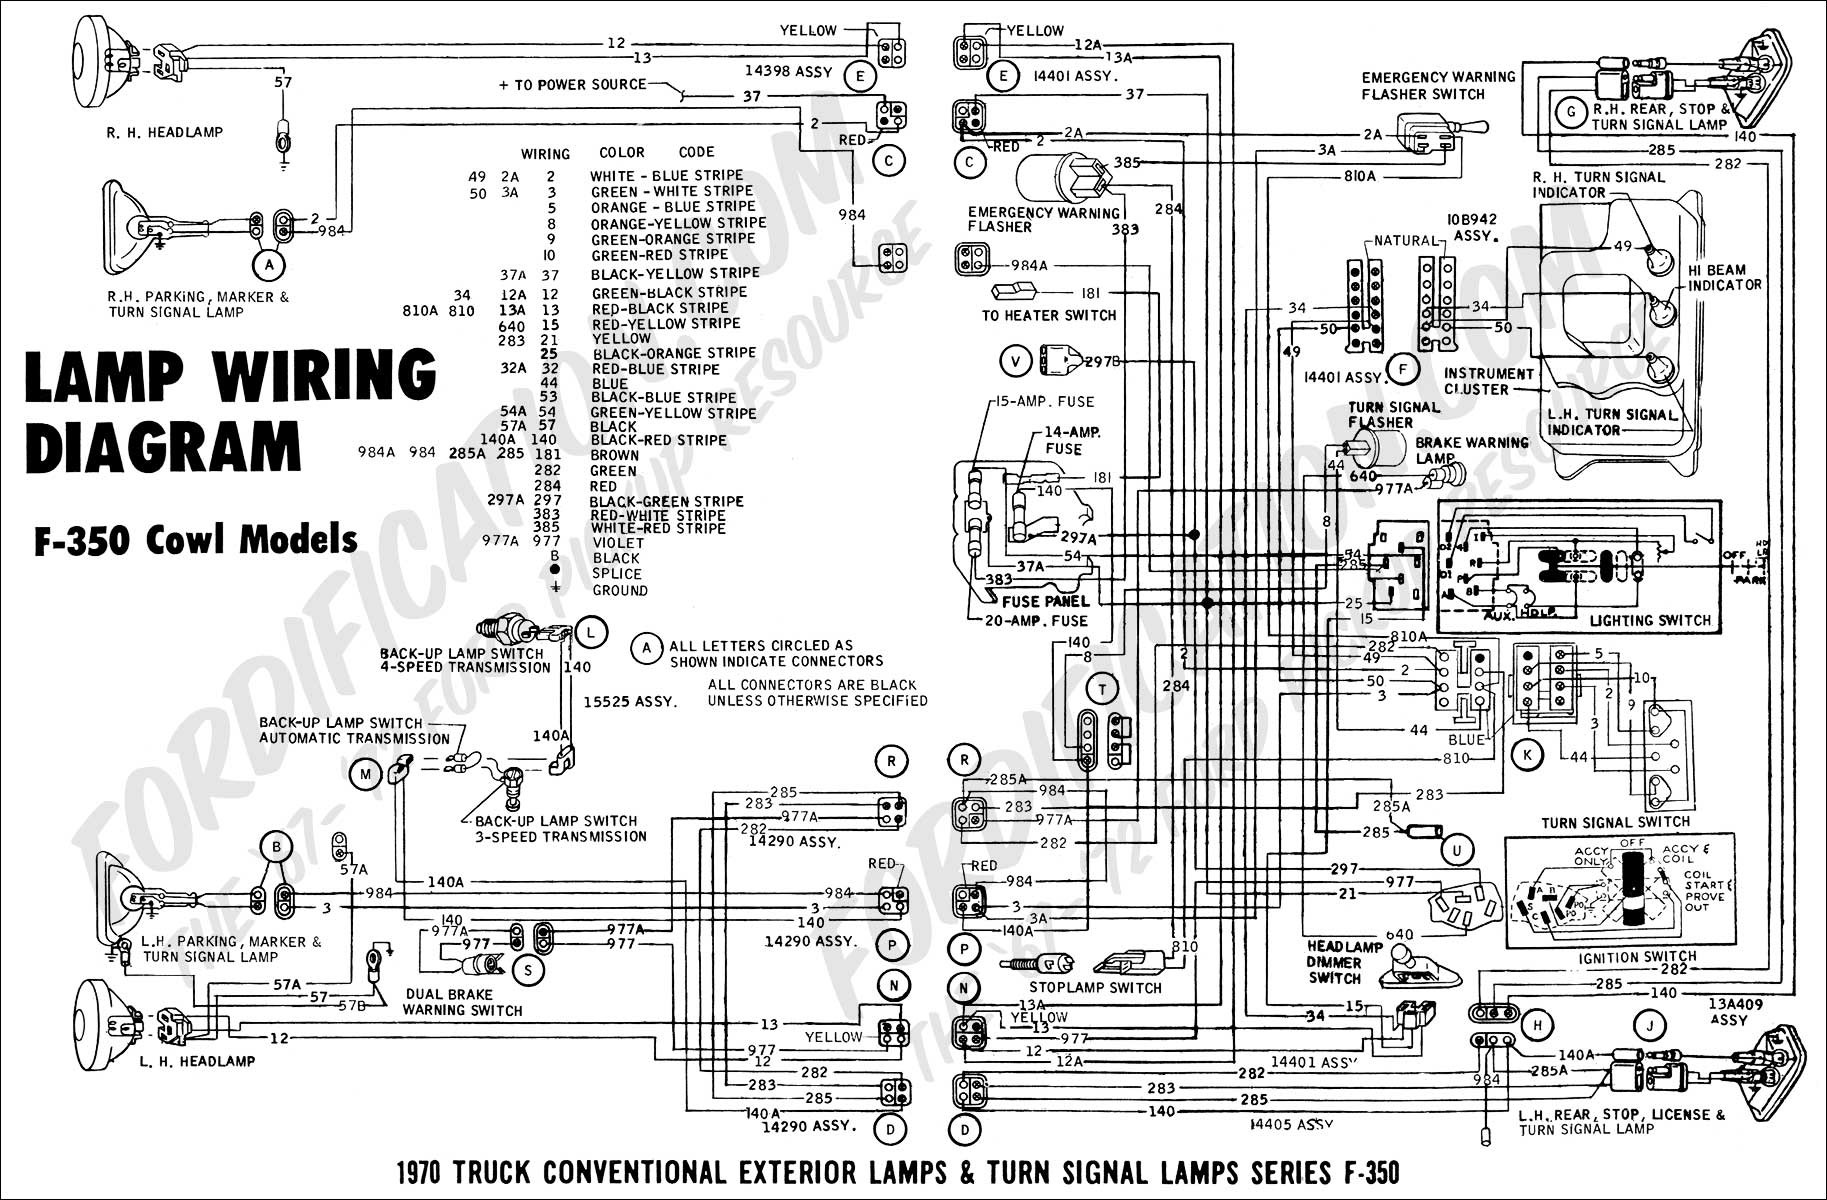 2001 F350 Wiring Diagram Rear Lights